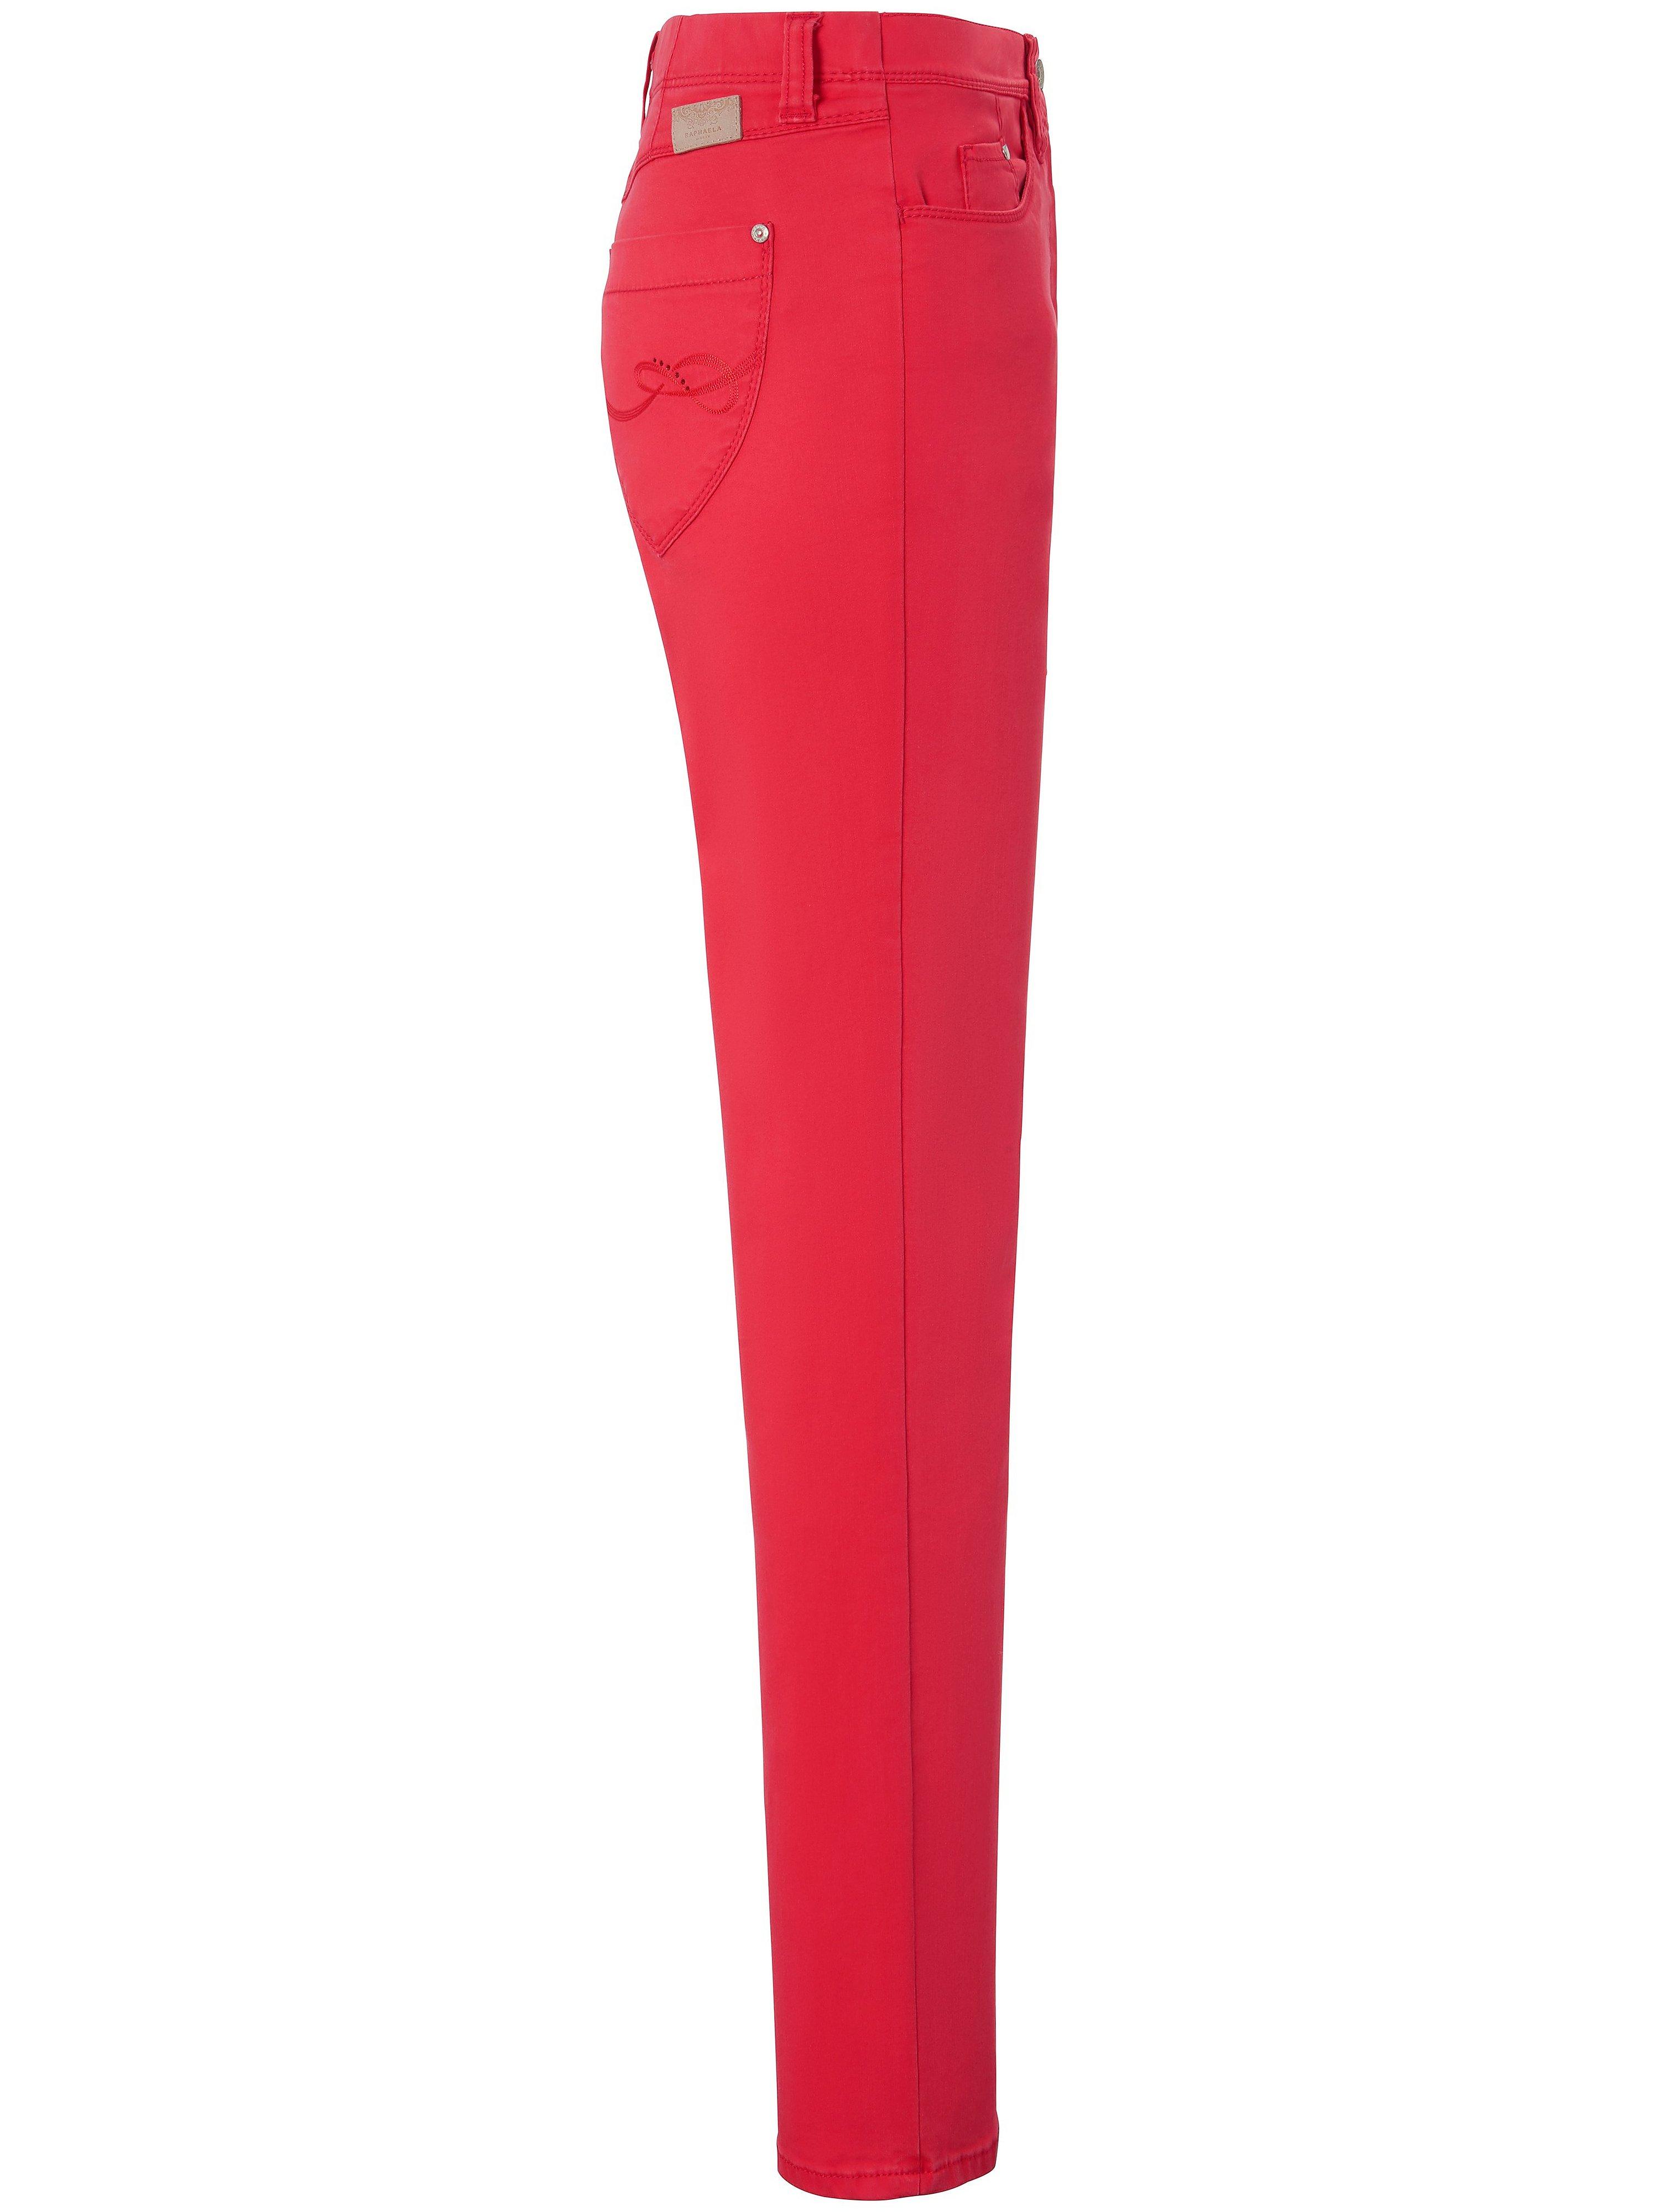 ProForm S Super Slim-jeans model Laura Touch Fra Raphaela by Brax rød